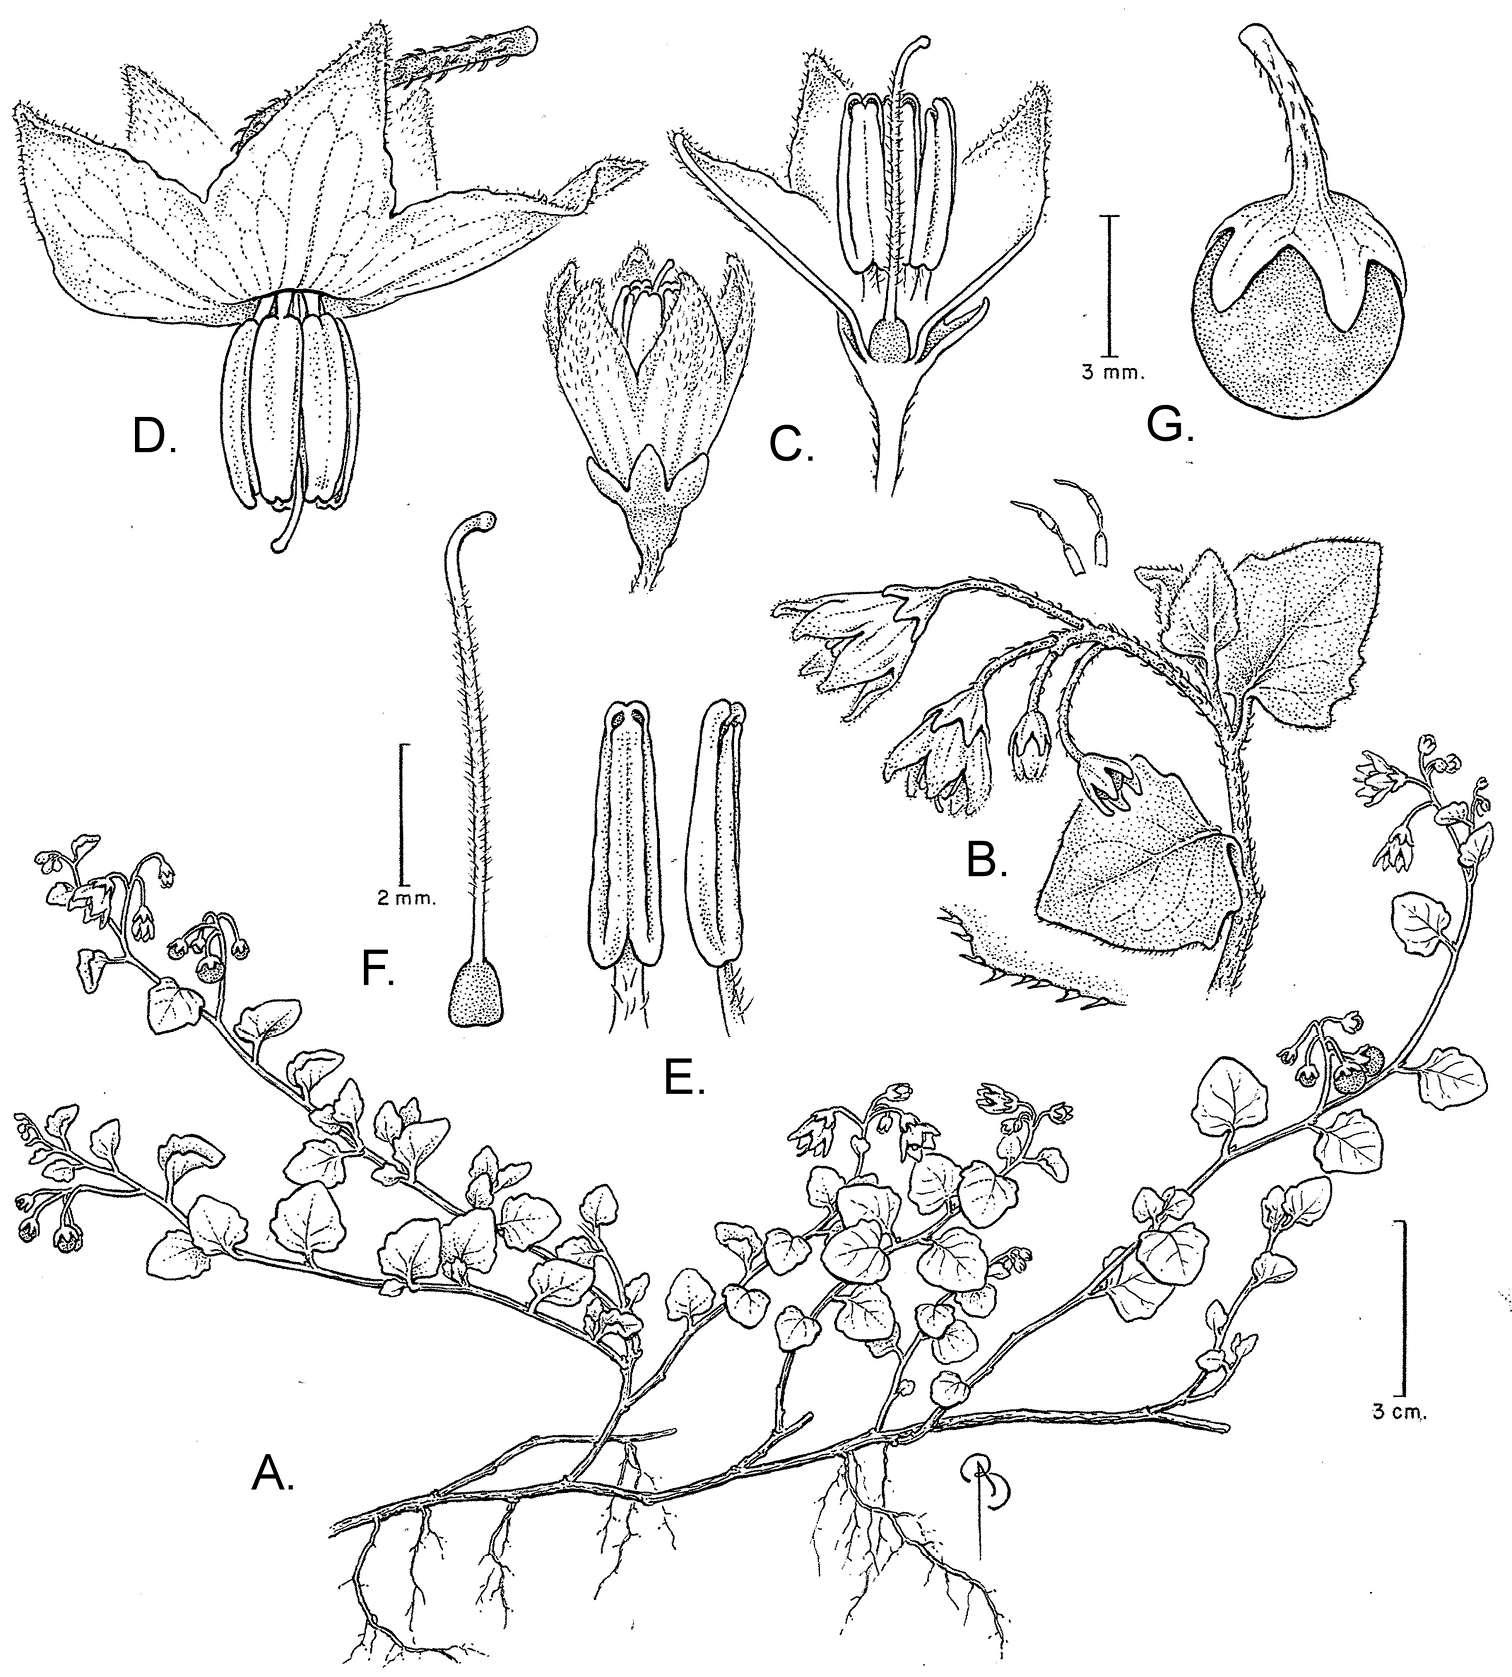 581.phytokeys 47 4423 sp 1 p 1